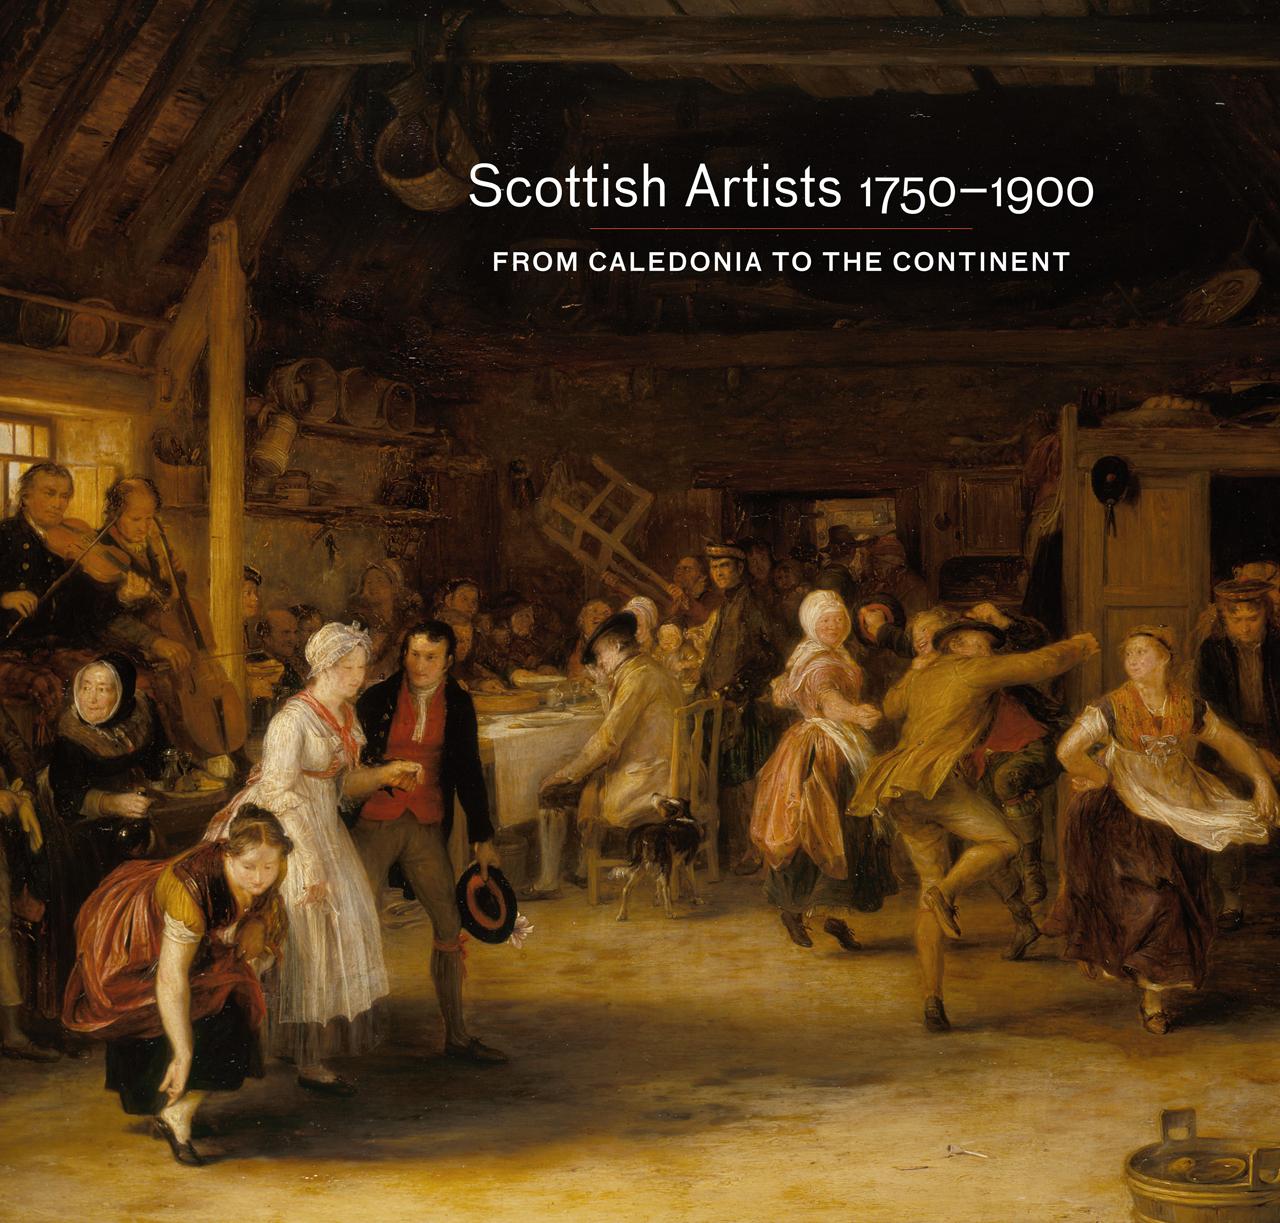 Scottish Art: Scottish Artists 1750-1900: From Caledonia To The